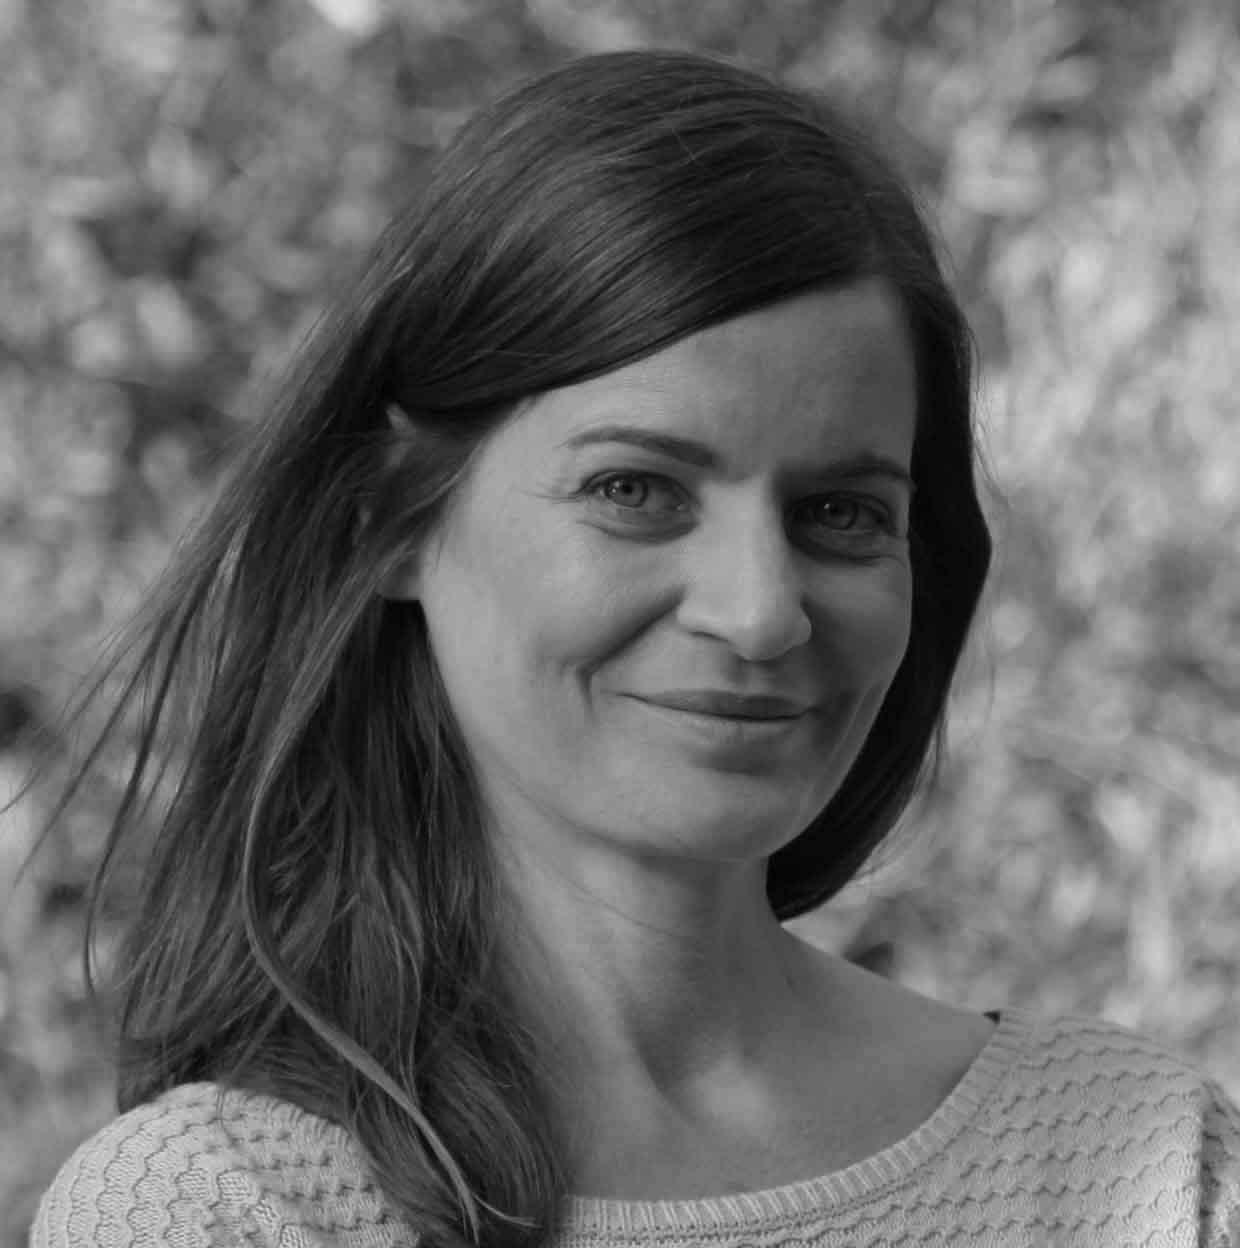 Joy Gardeur Naturopathe portrait en noir et blanc